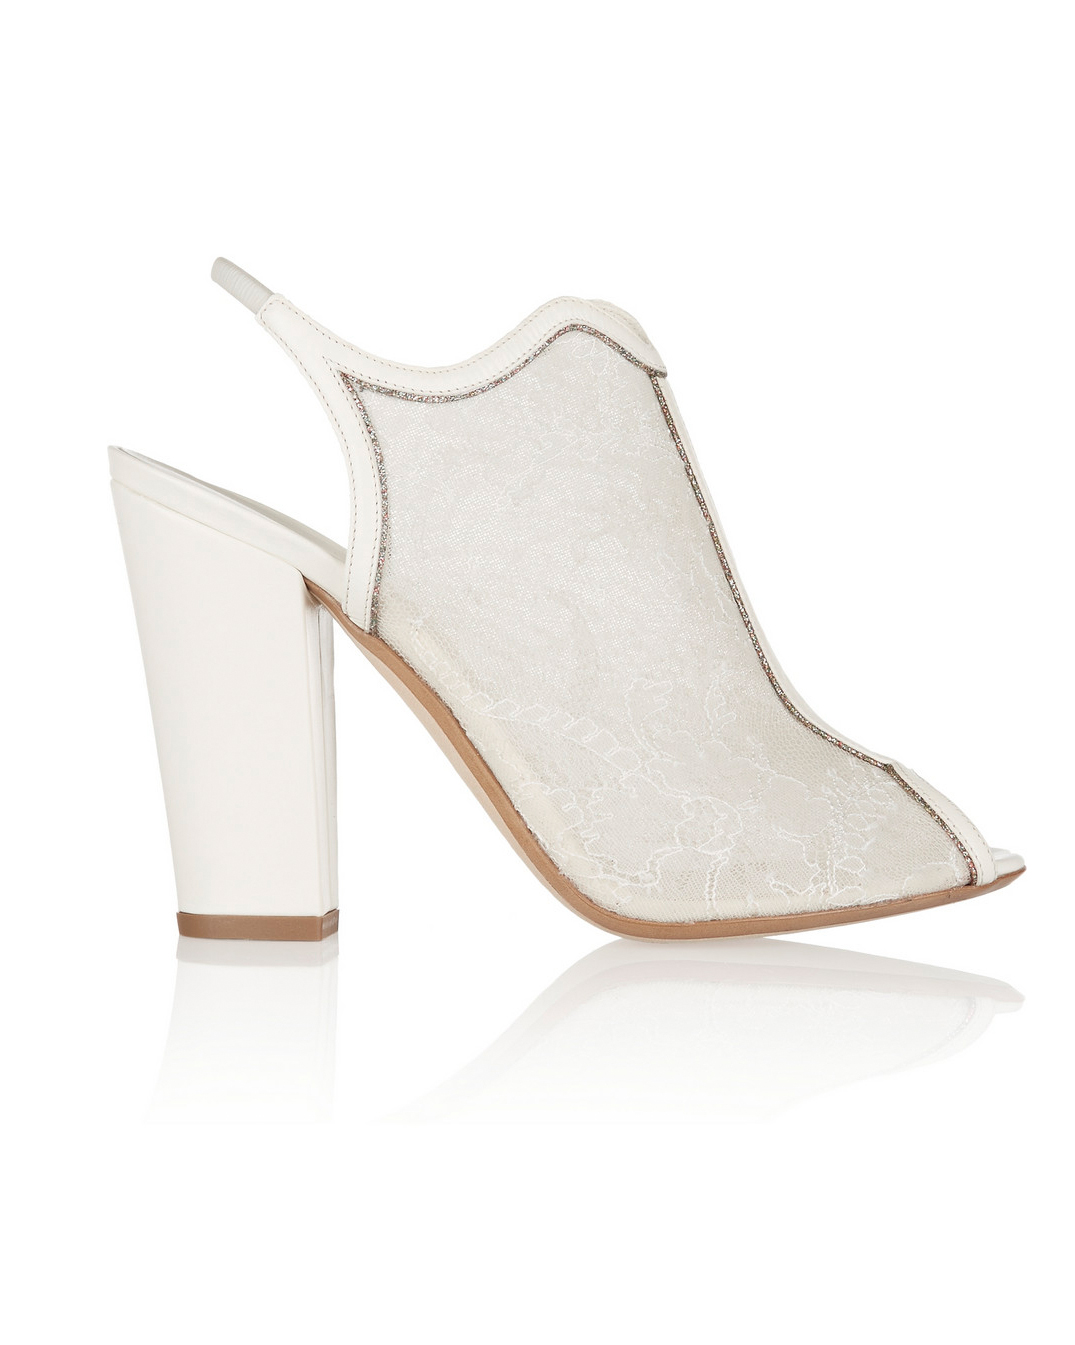 fall-wedding-shoes-nicholas-kirkwood-lace-0914.jpg